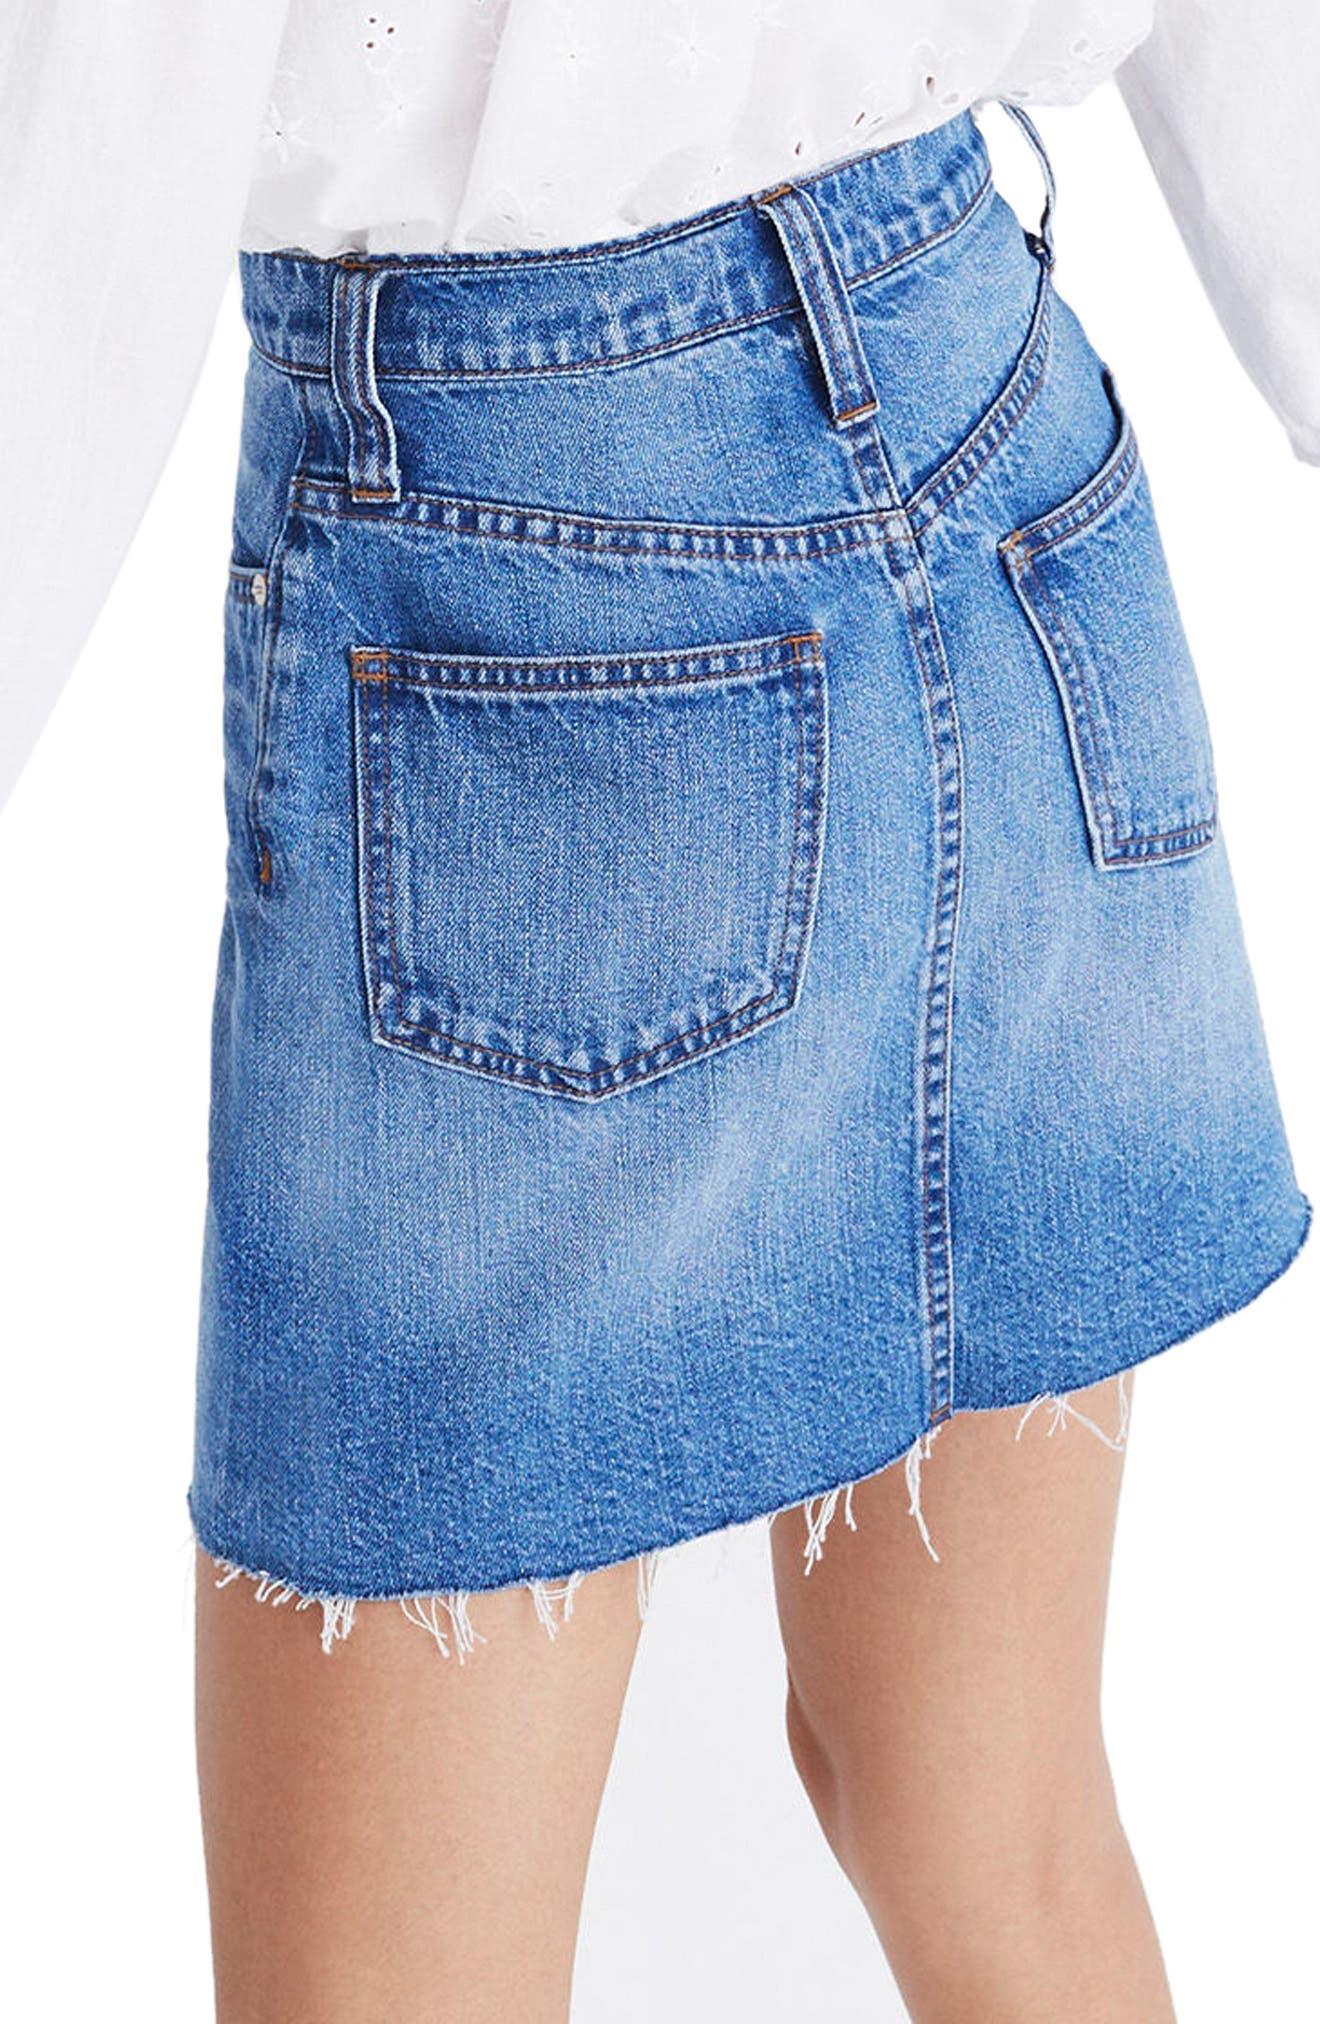 Frisco Denim Miniskirt,                             Alternate thumbnail 3, color,                             Leandra Wash